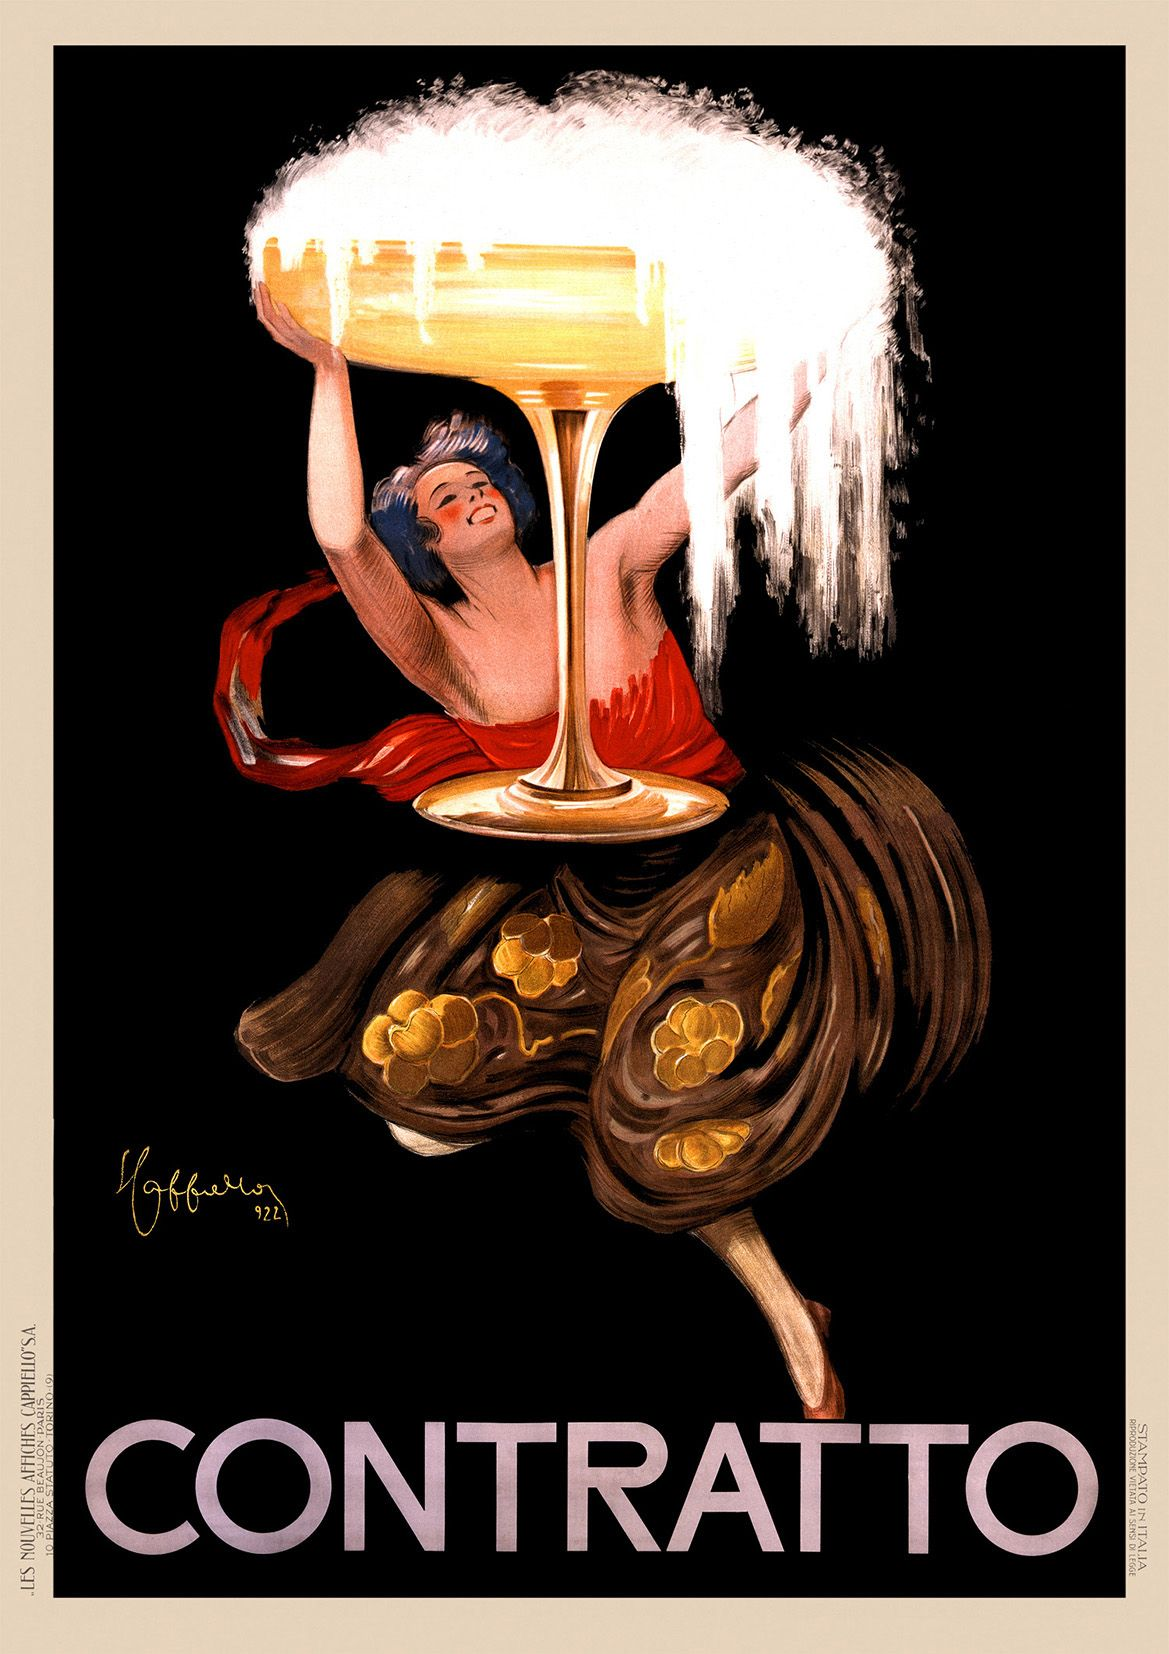 Contratto asti champagne 1922 italy vintage advertising for Contratto 3 2